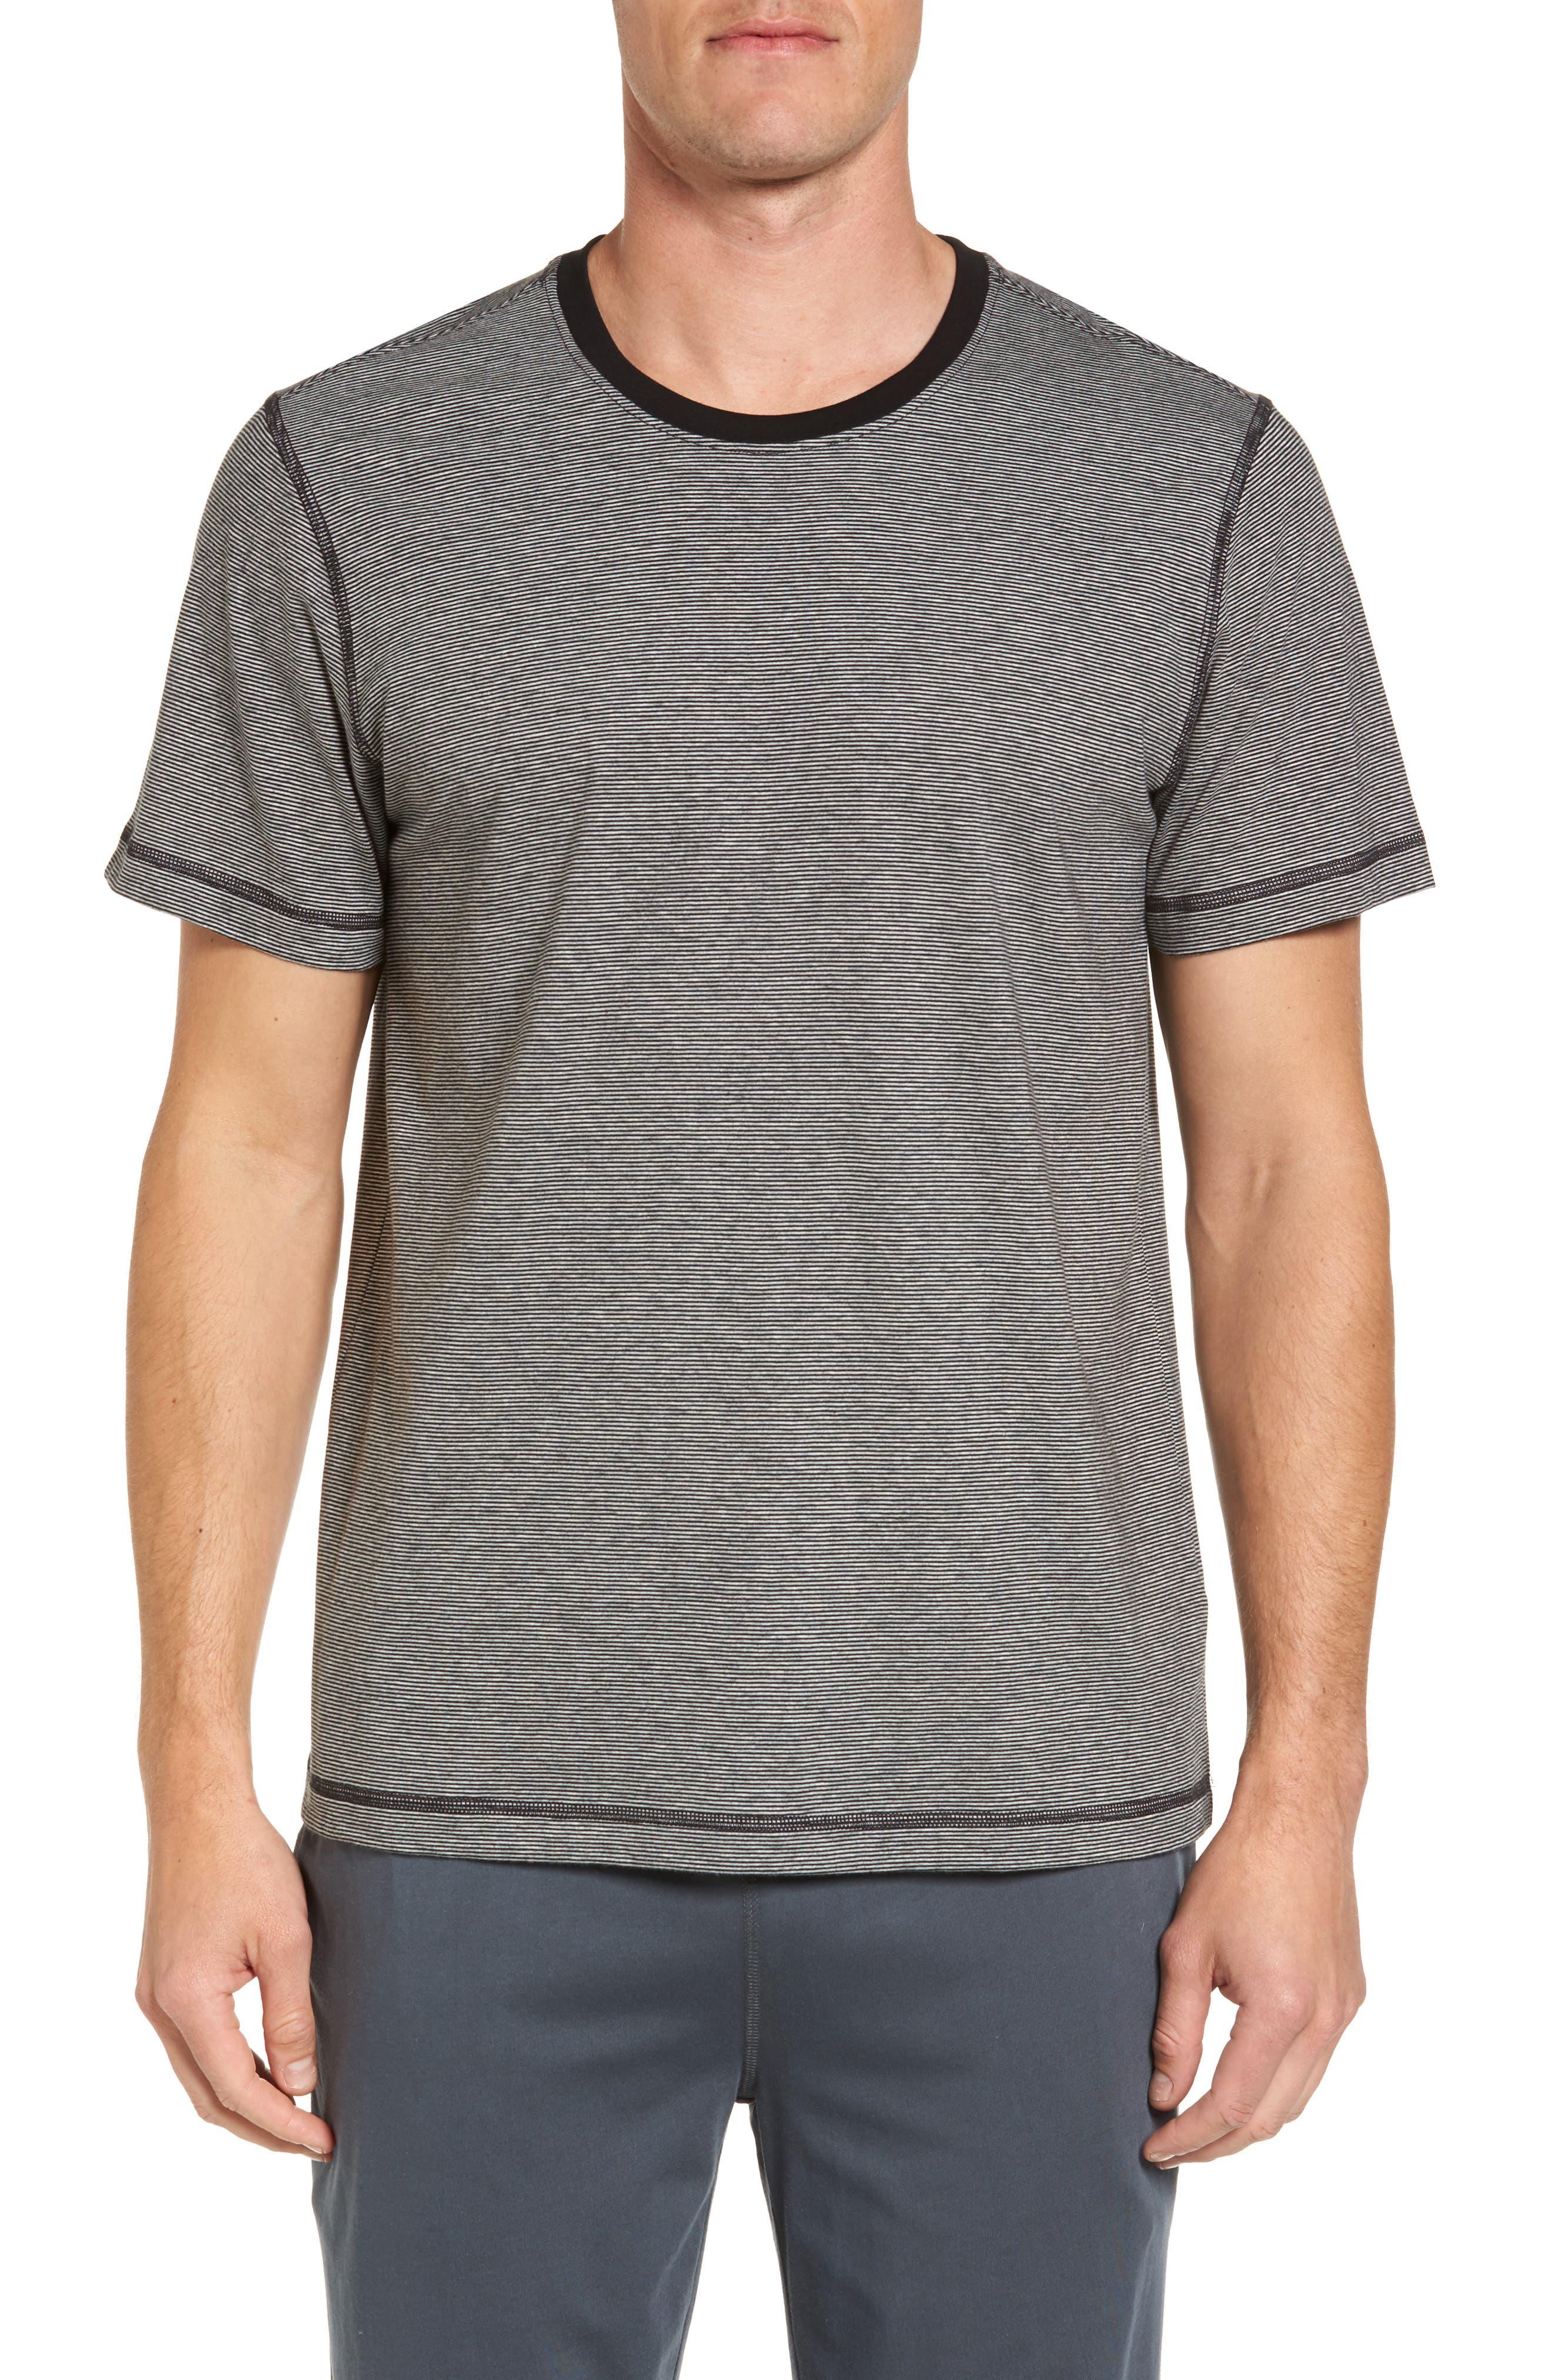 Peruvian Pima Cotton T-Shirt,                             Main thumbnail 1, color,                             Black/ Grey Heather